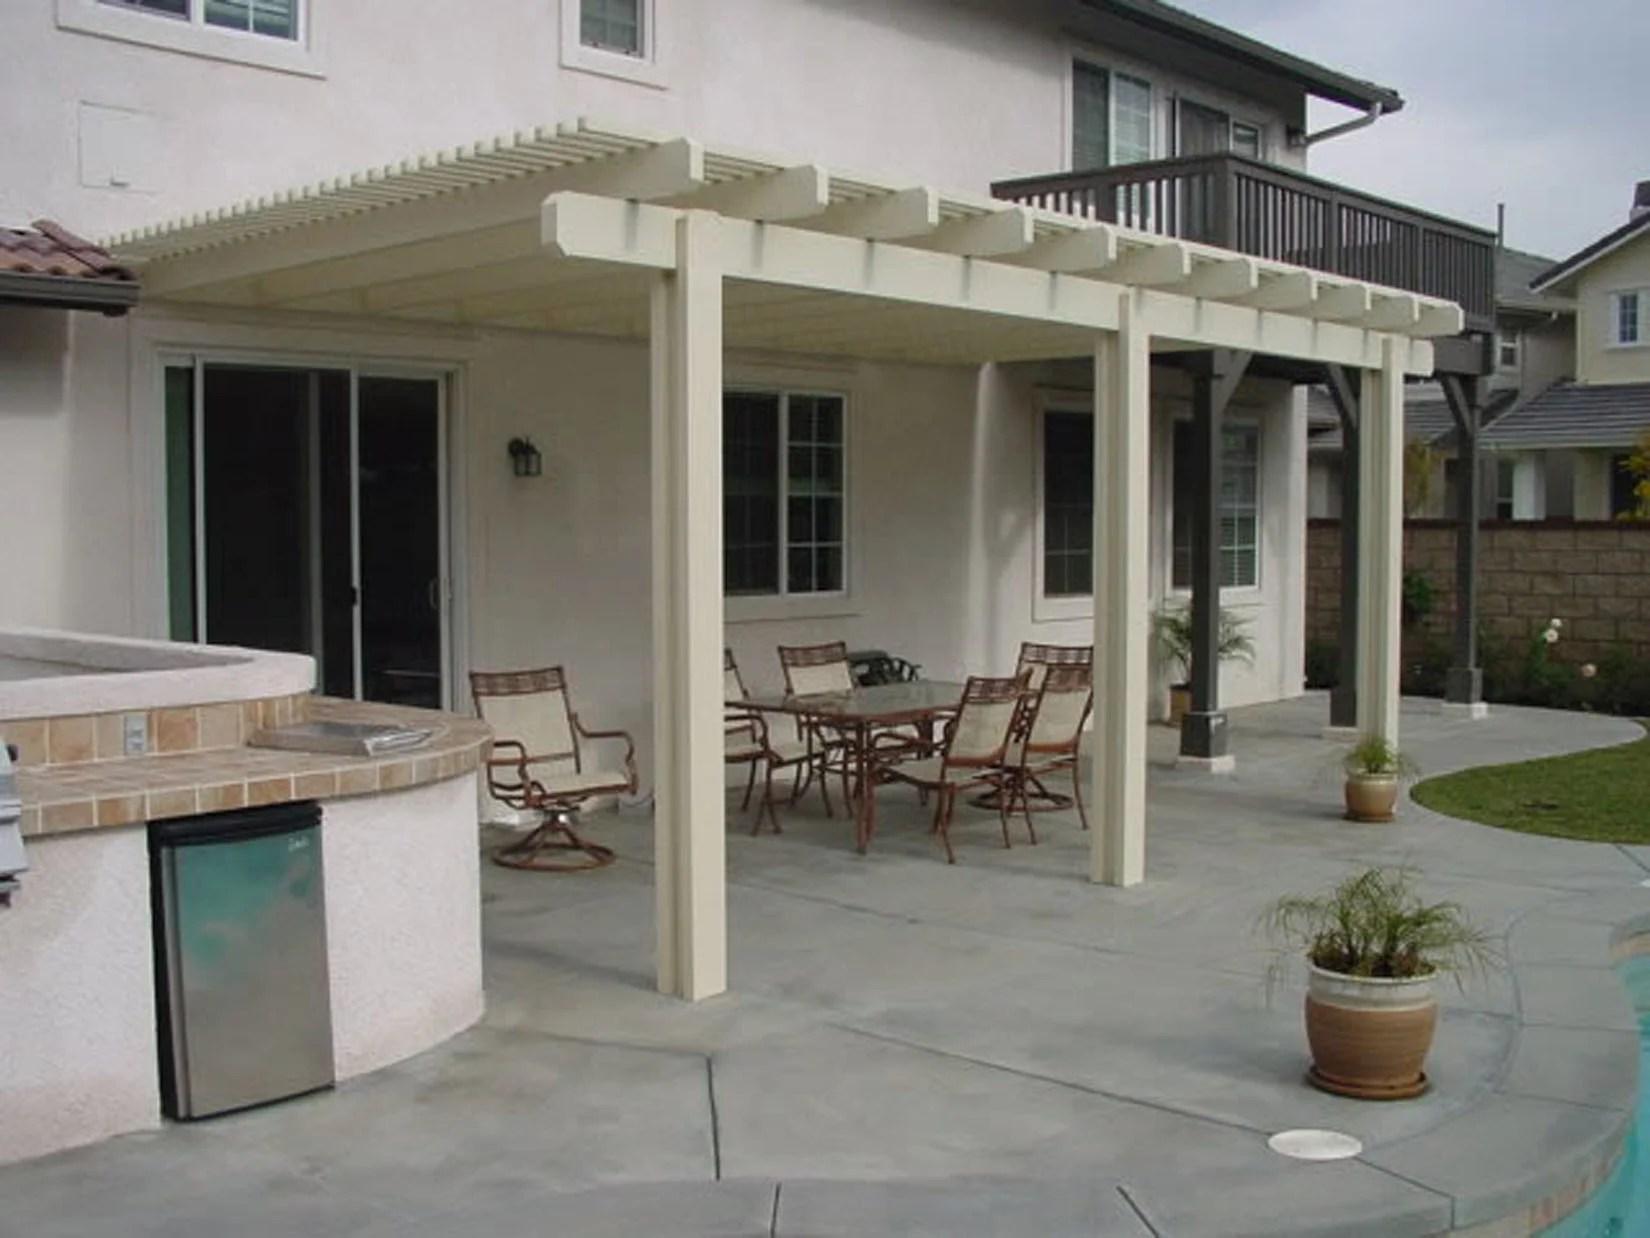 Patio Covers Photo Gallery backyard design ideas on Build Backyard Patio id=56561